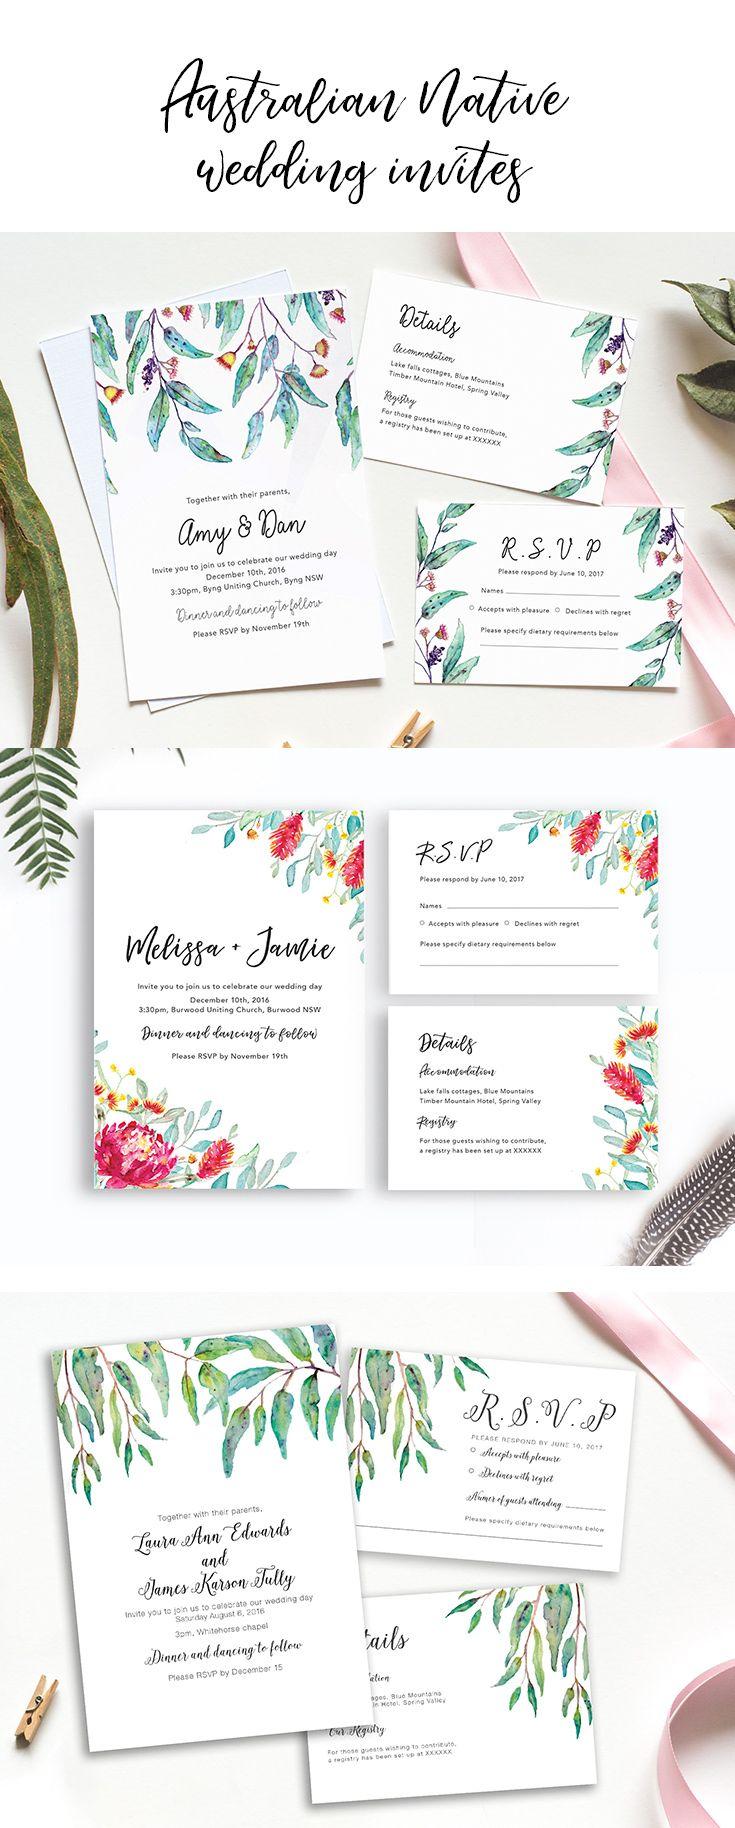 Australian Native Wedding Invitations by The Daydream Creative ...